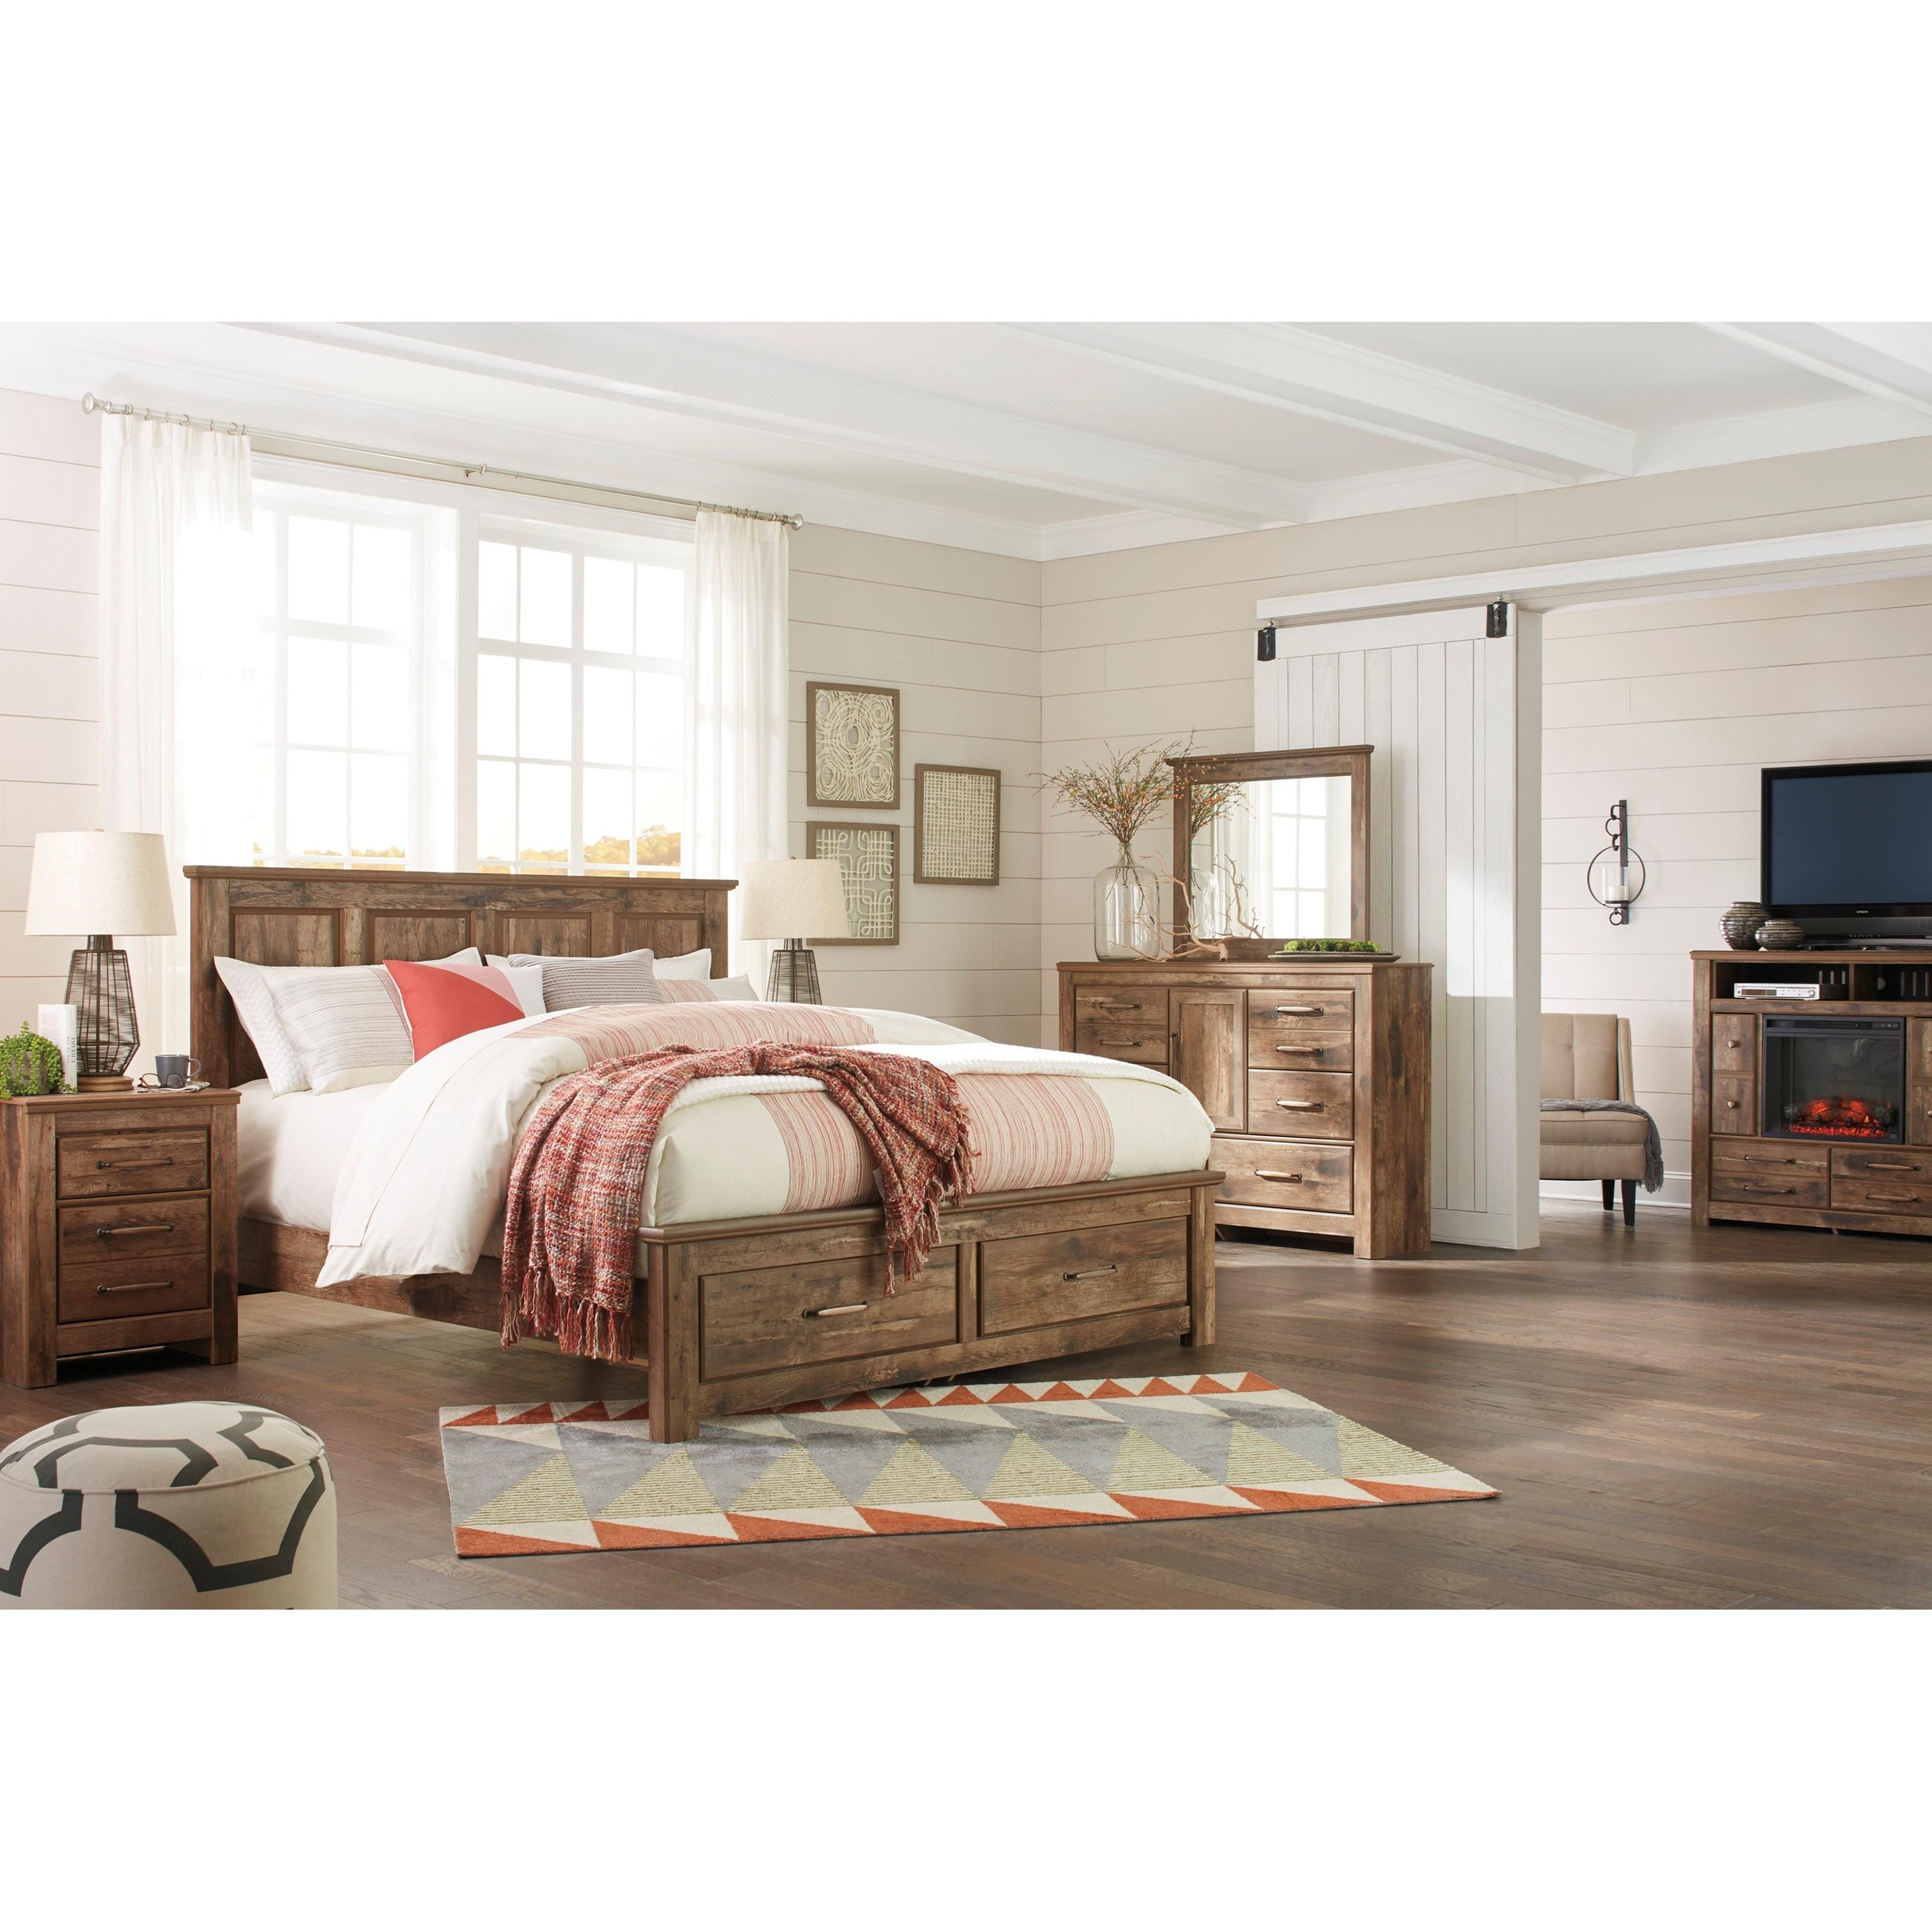 Ashley Signature Design Blaneville King Panel Storage Bed Johnny Janosik Platform Beds Low